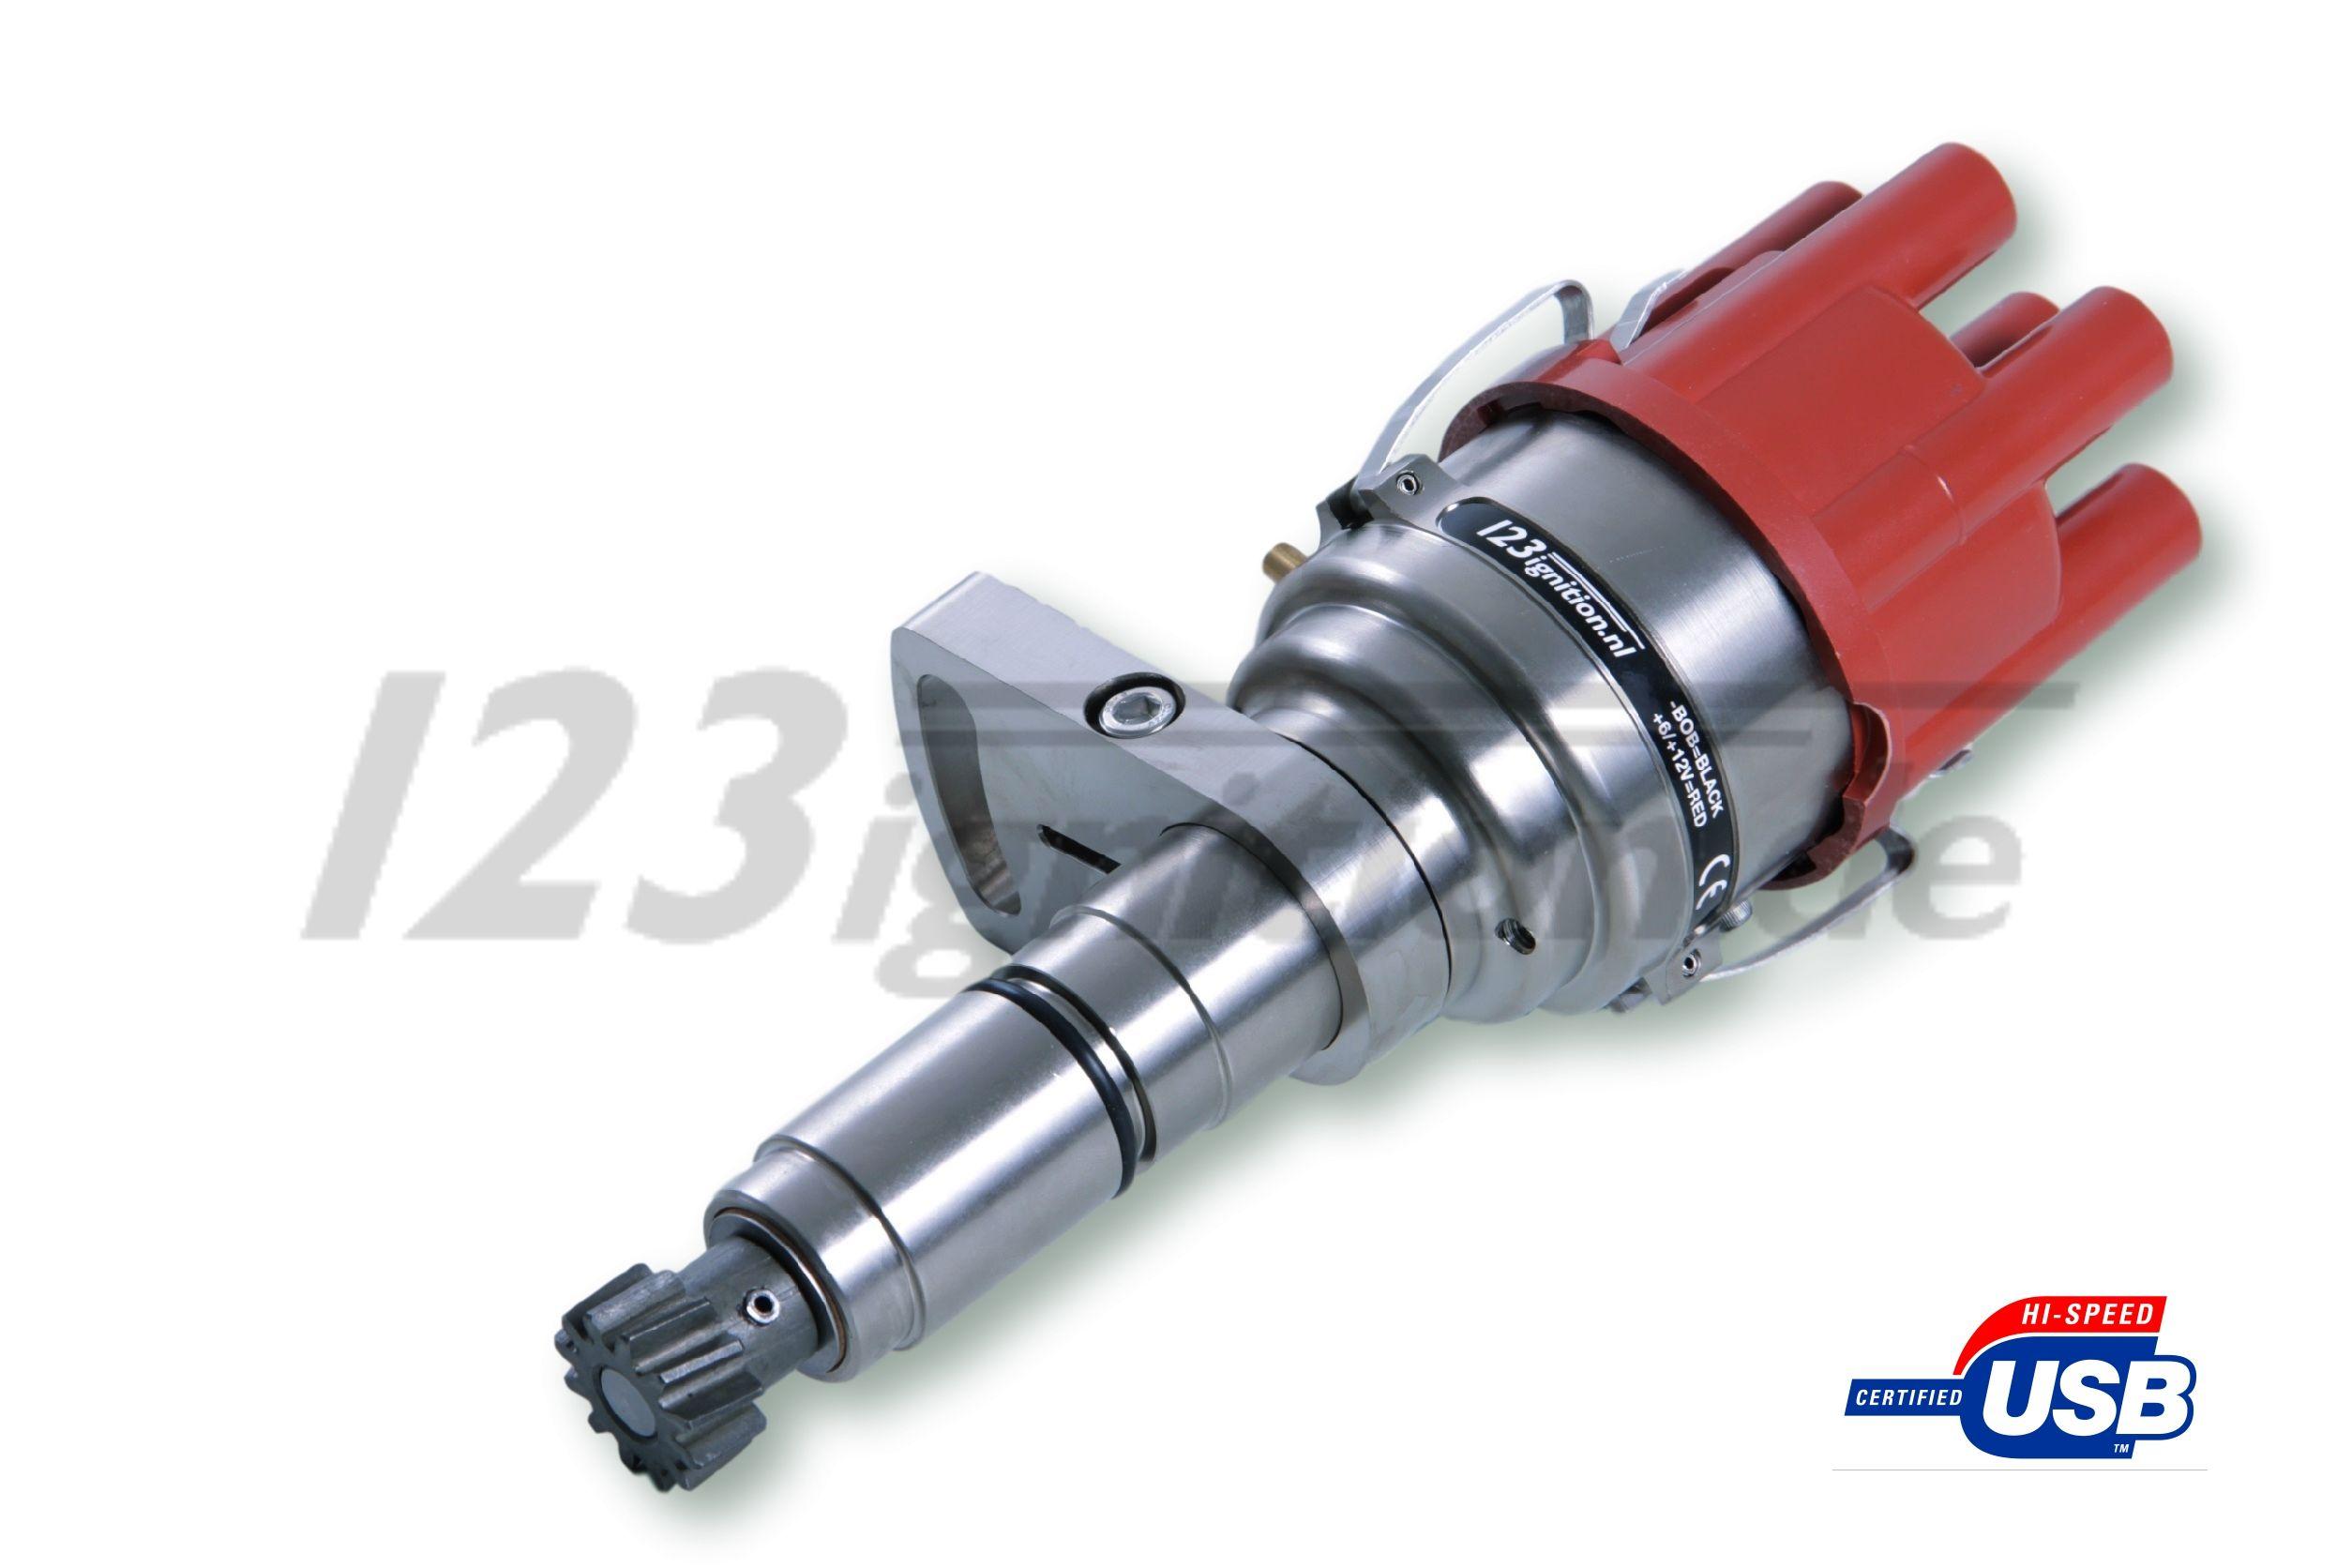 123\TUNE USB tænding distributør til Porsche 3.0 3.2 3.3 Carrera Turbo